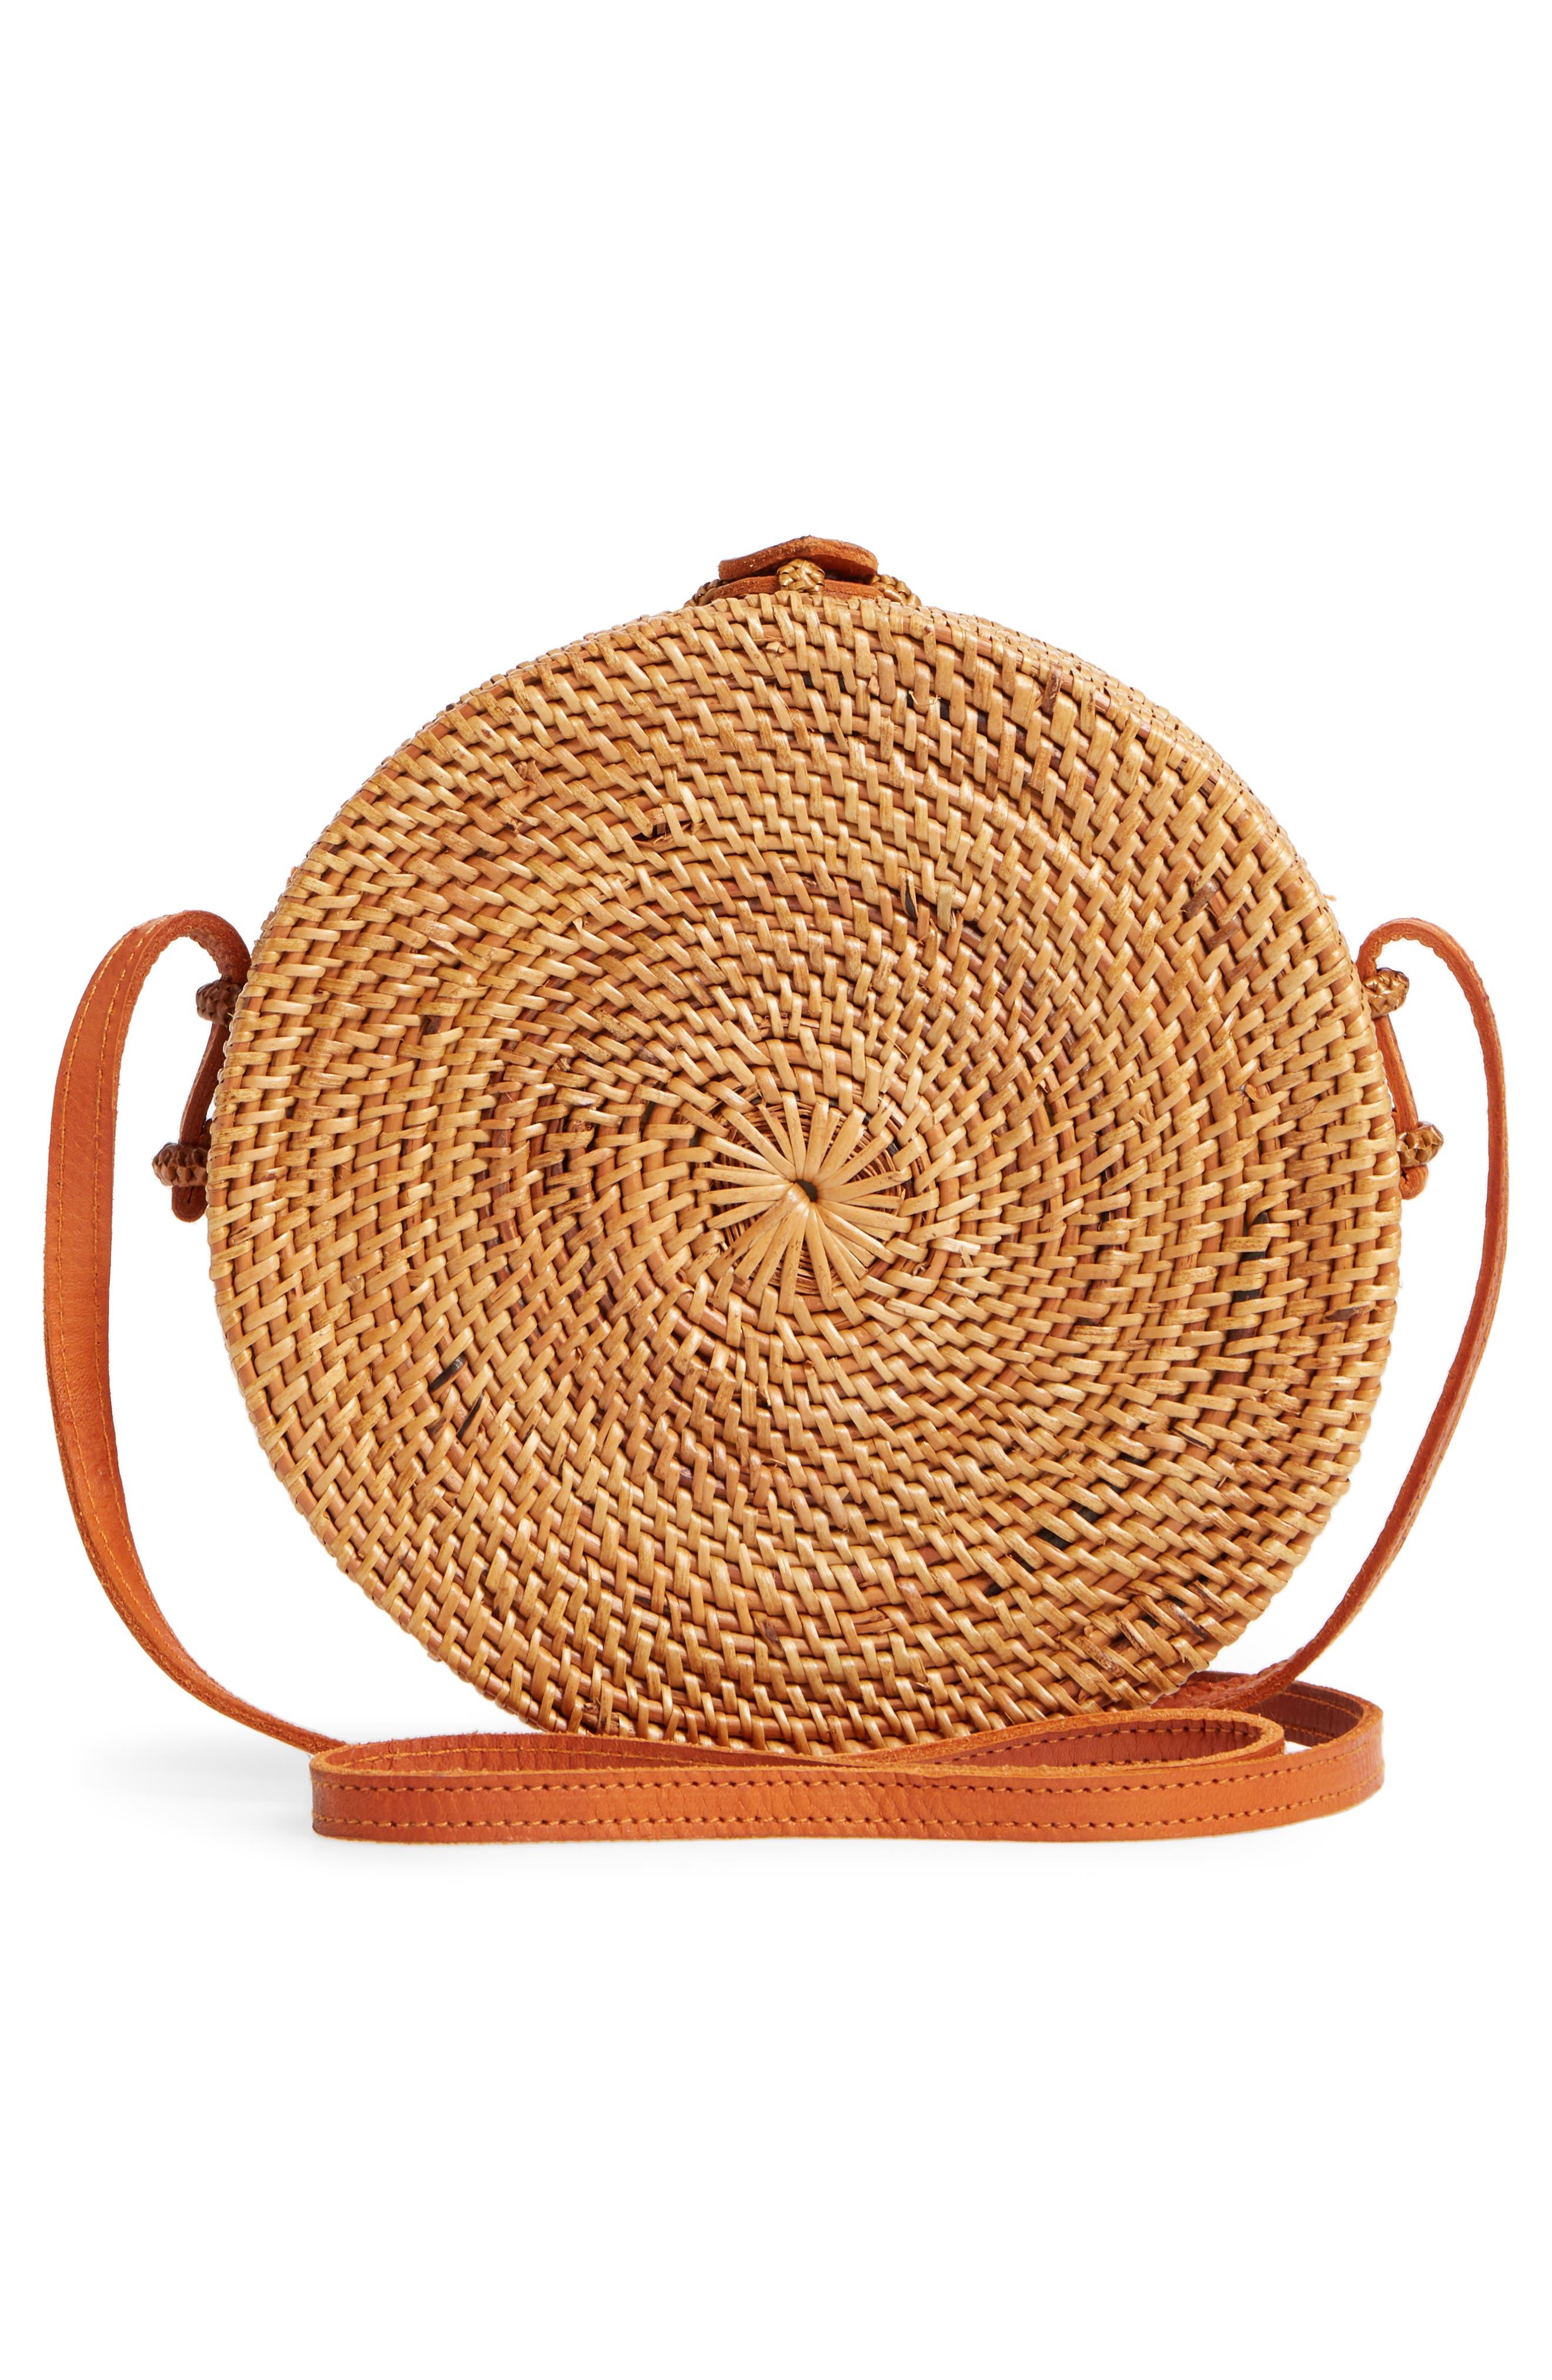 Woven Rattan Circle Basket Crossbody,                             Alternate thumbnail 3, color,                             Tan